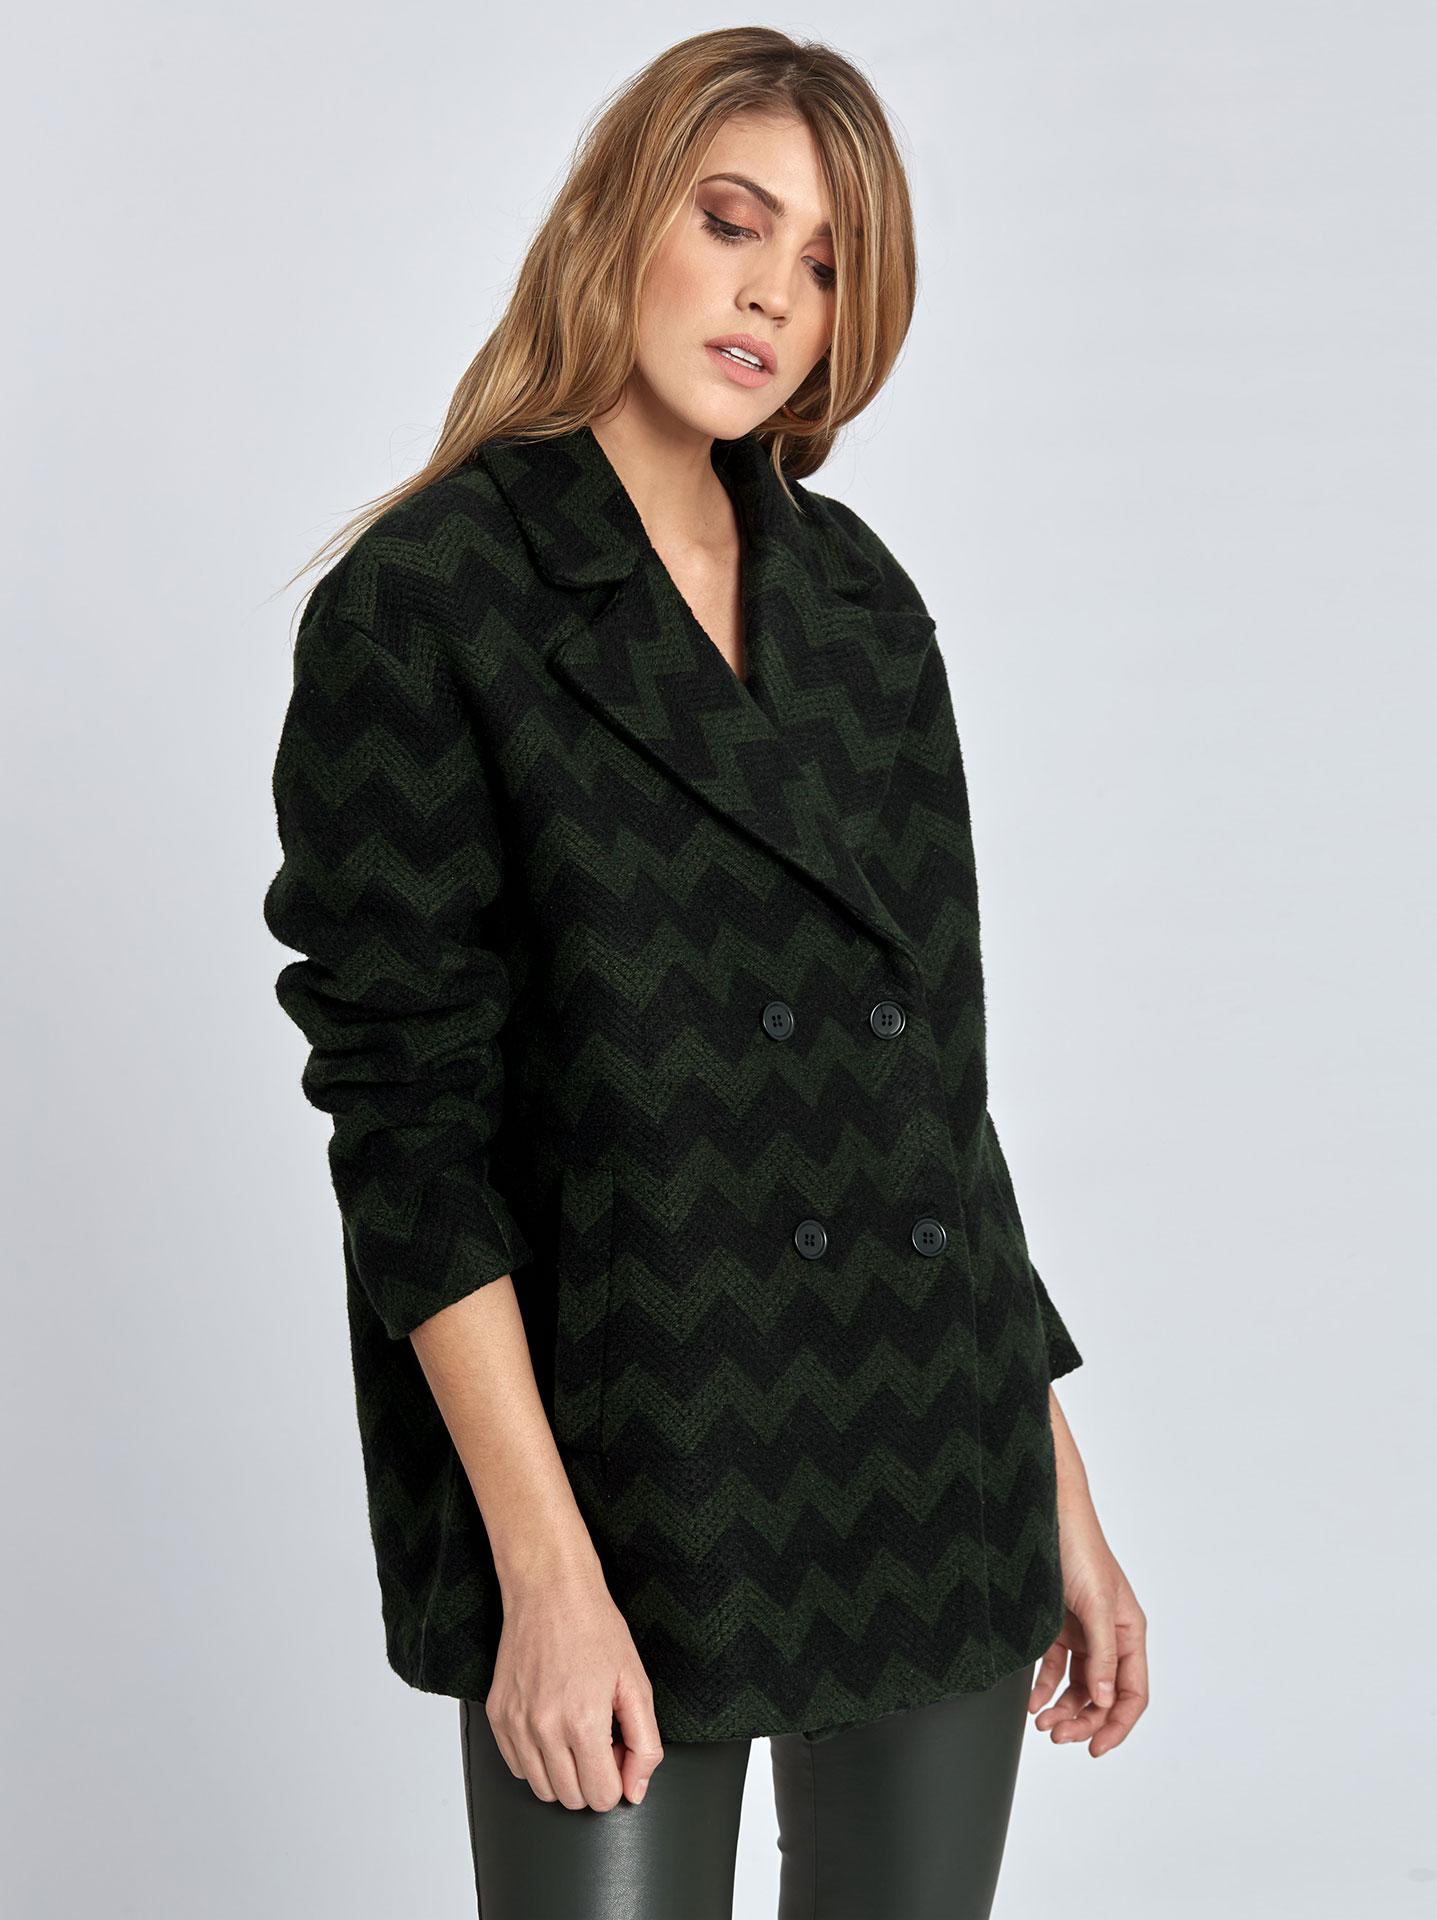 c2f6ff07138f Oversized παλτό με ζικ ζακ σχέδιο σε πρασινο σκουρο